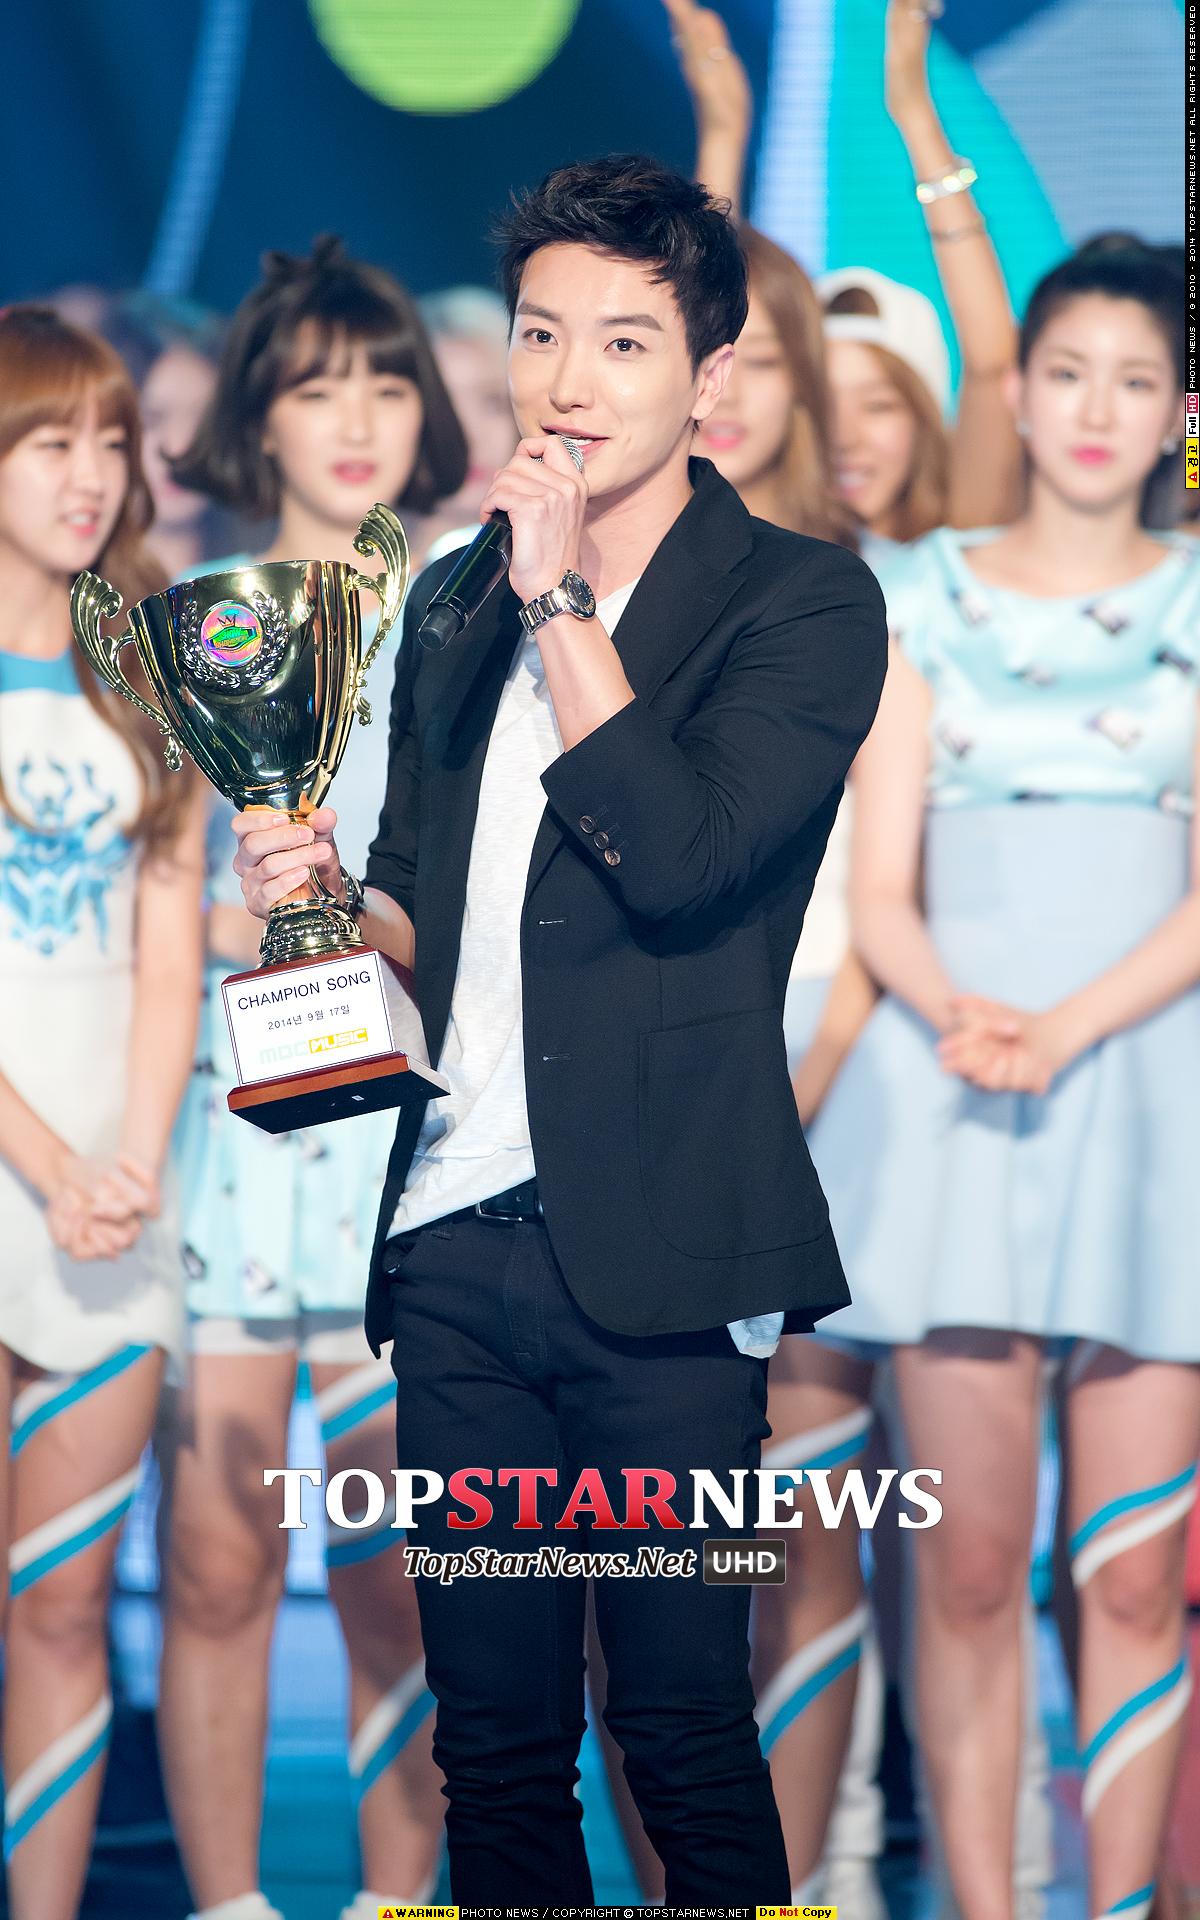 8.Super Junior 利特 其實小編也覺得利特是可靠的媽媽XD鄰家大哥哥感覺像是銀赫或東海,金記者始源也不錯XD